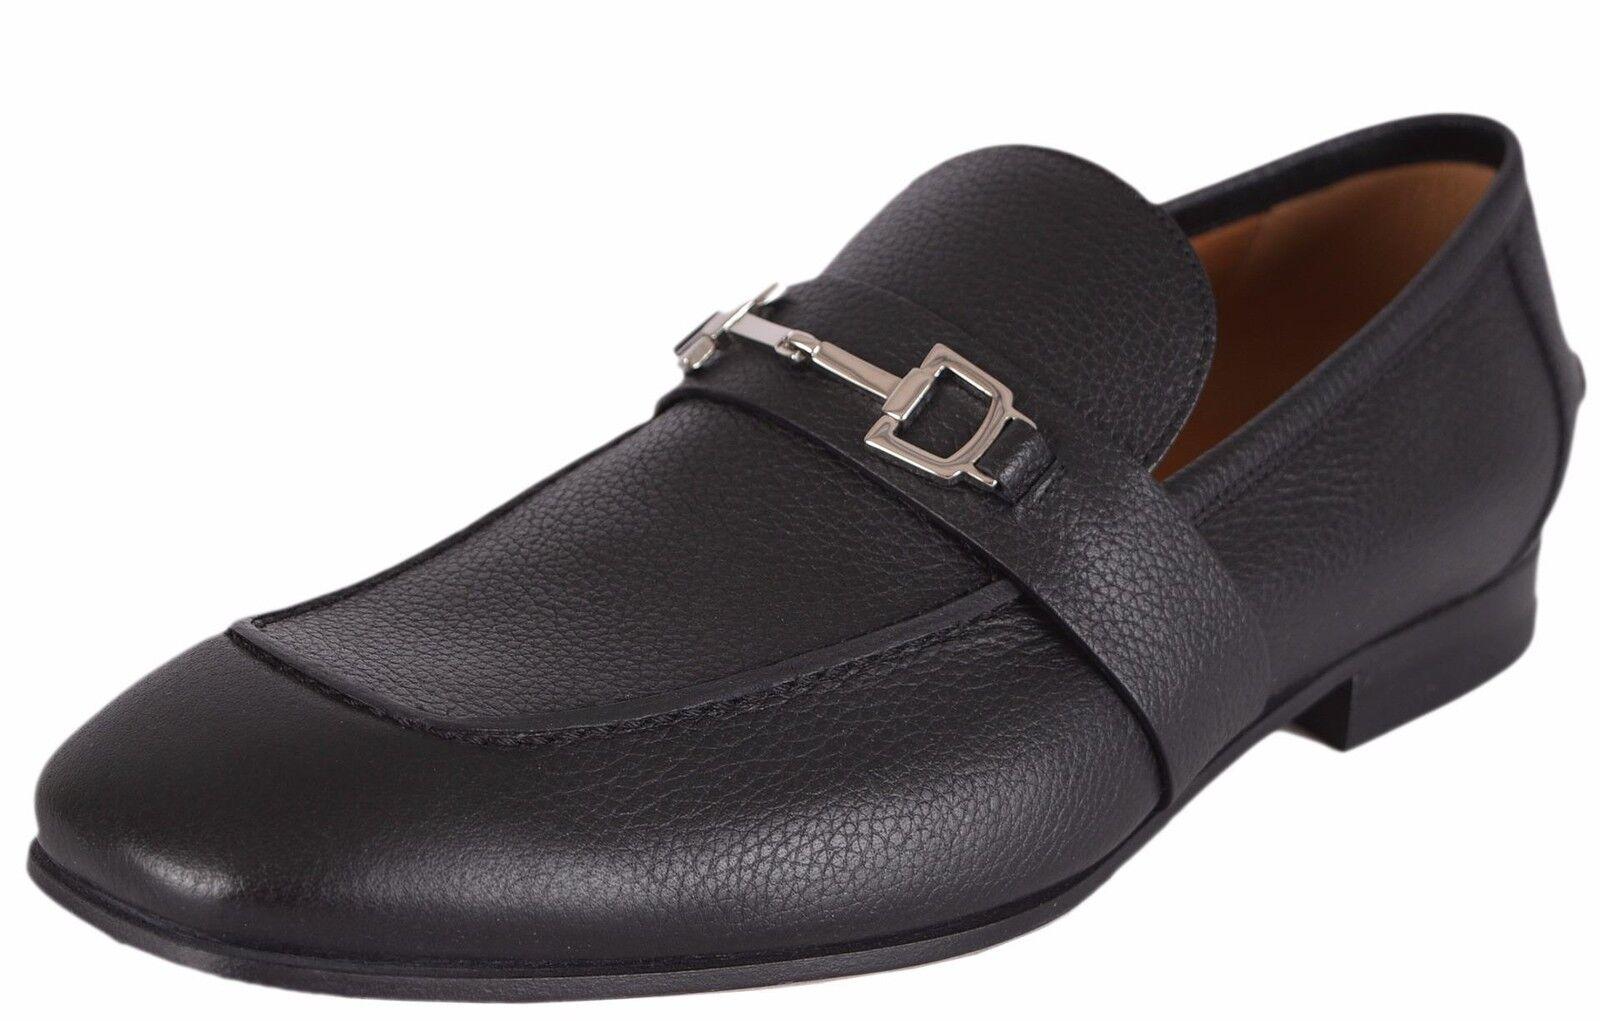 NEW Gucci Men's $820 Black Leather Praga Horsebit Loafers Shoes 13.5 G 14.5 US